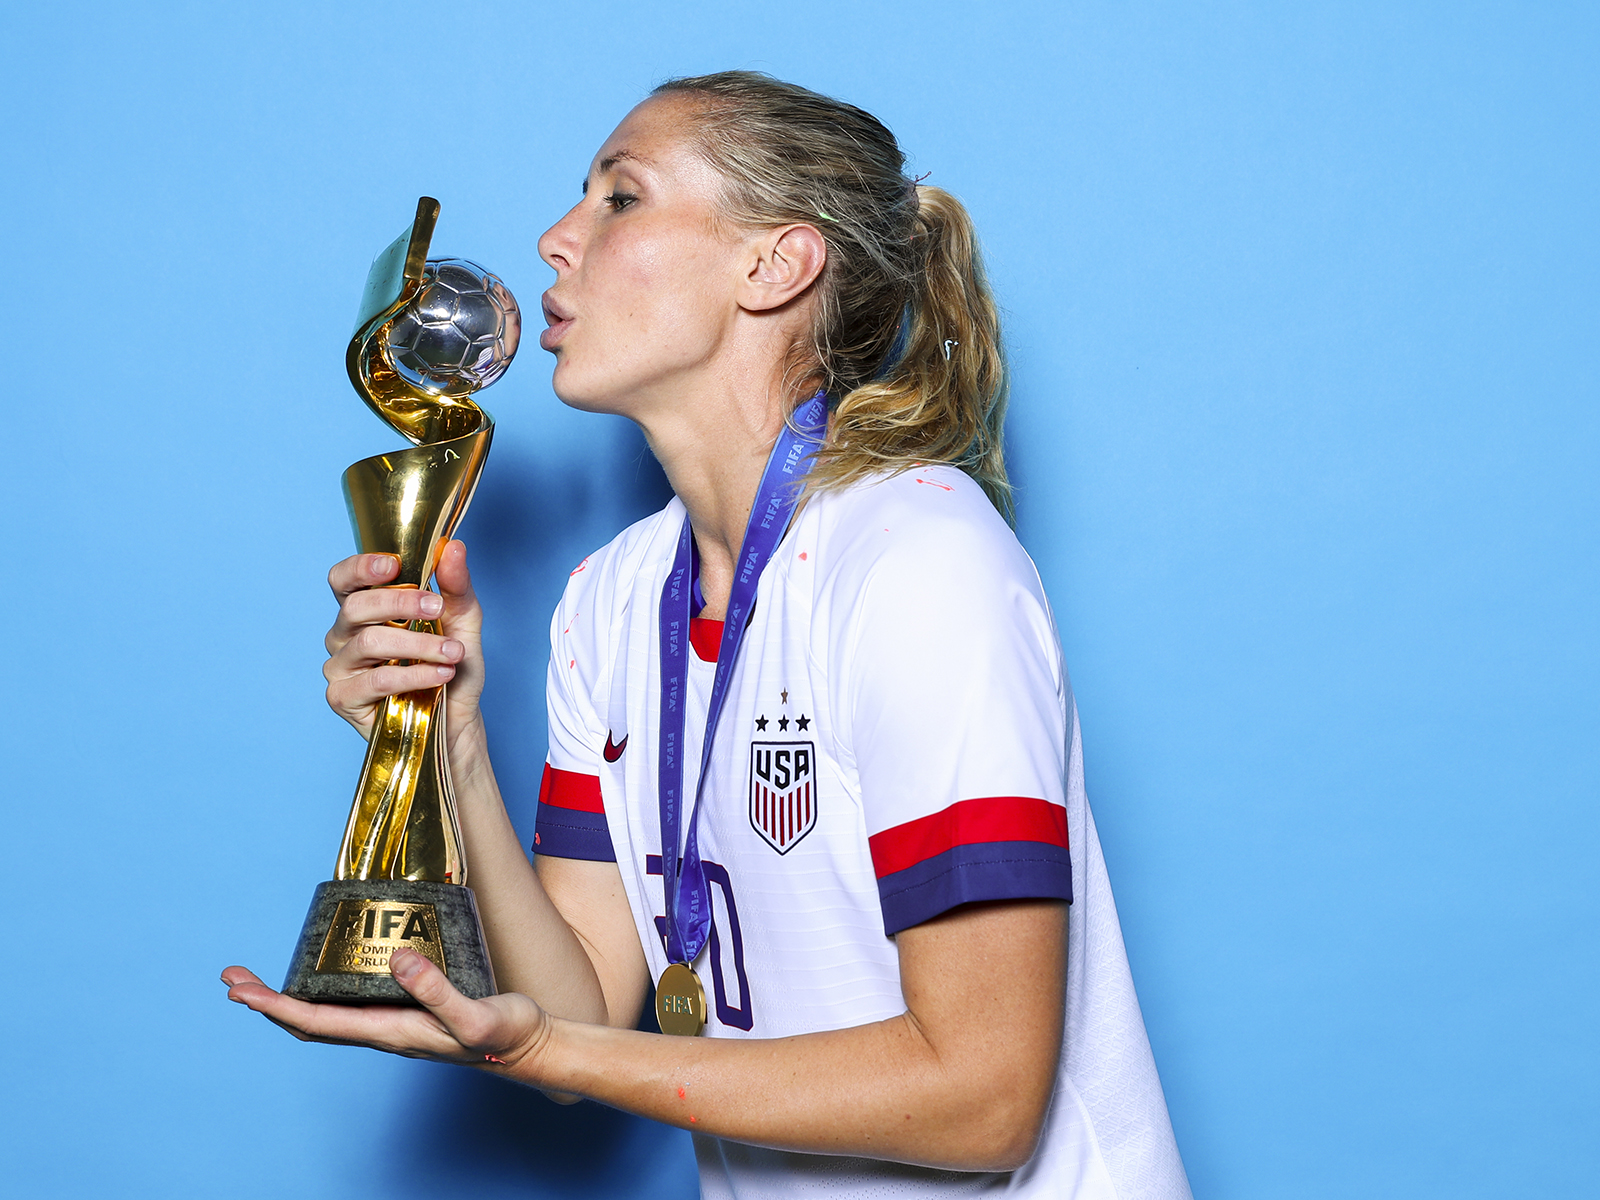 soccer, uswnt, 2019 women's world cup, alex morgan, megan rapinoe, Rose Lavelle, julie ertz, united states, usa, wire